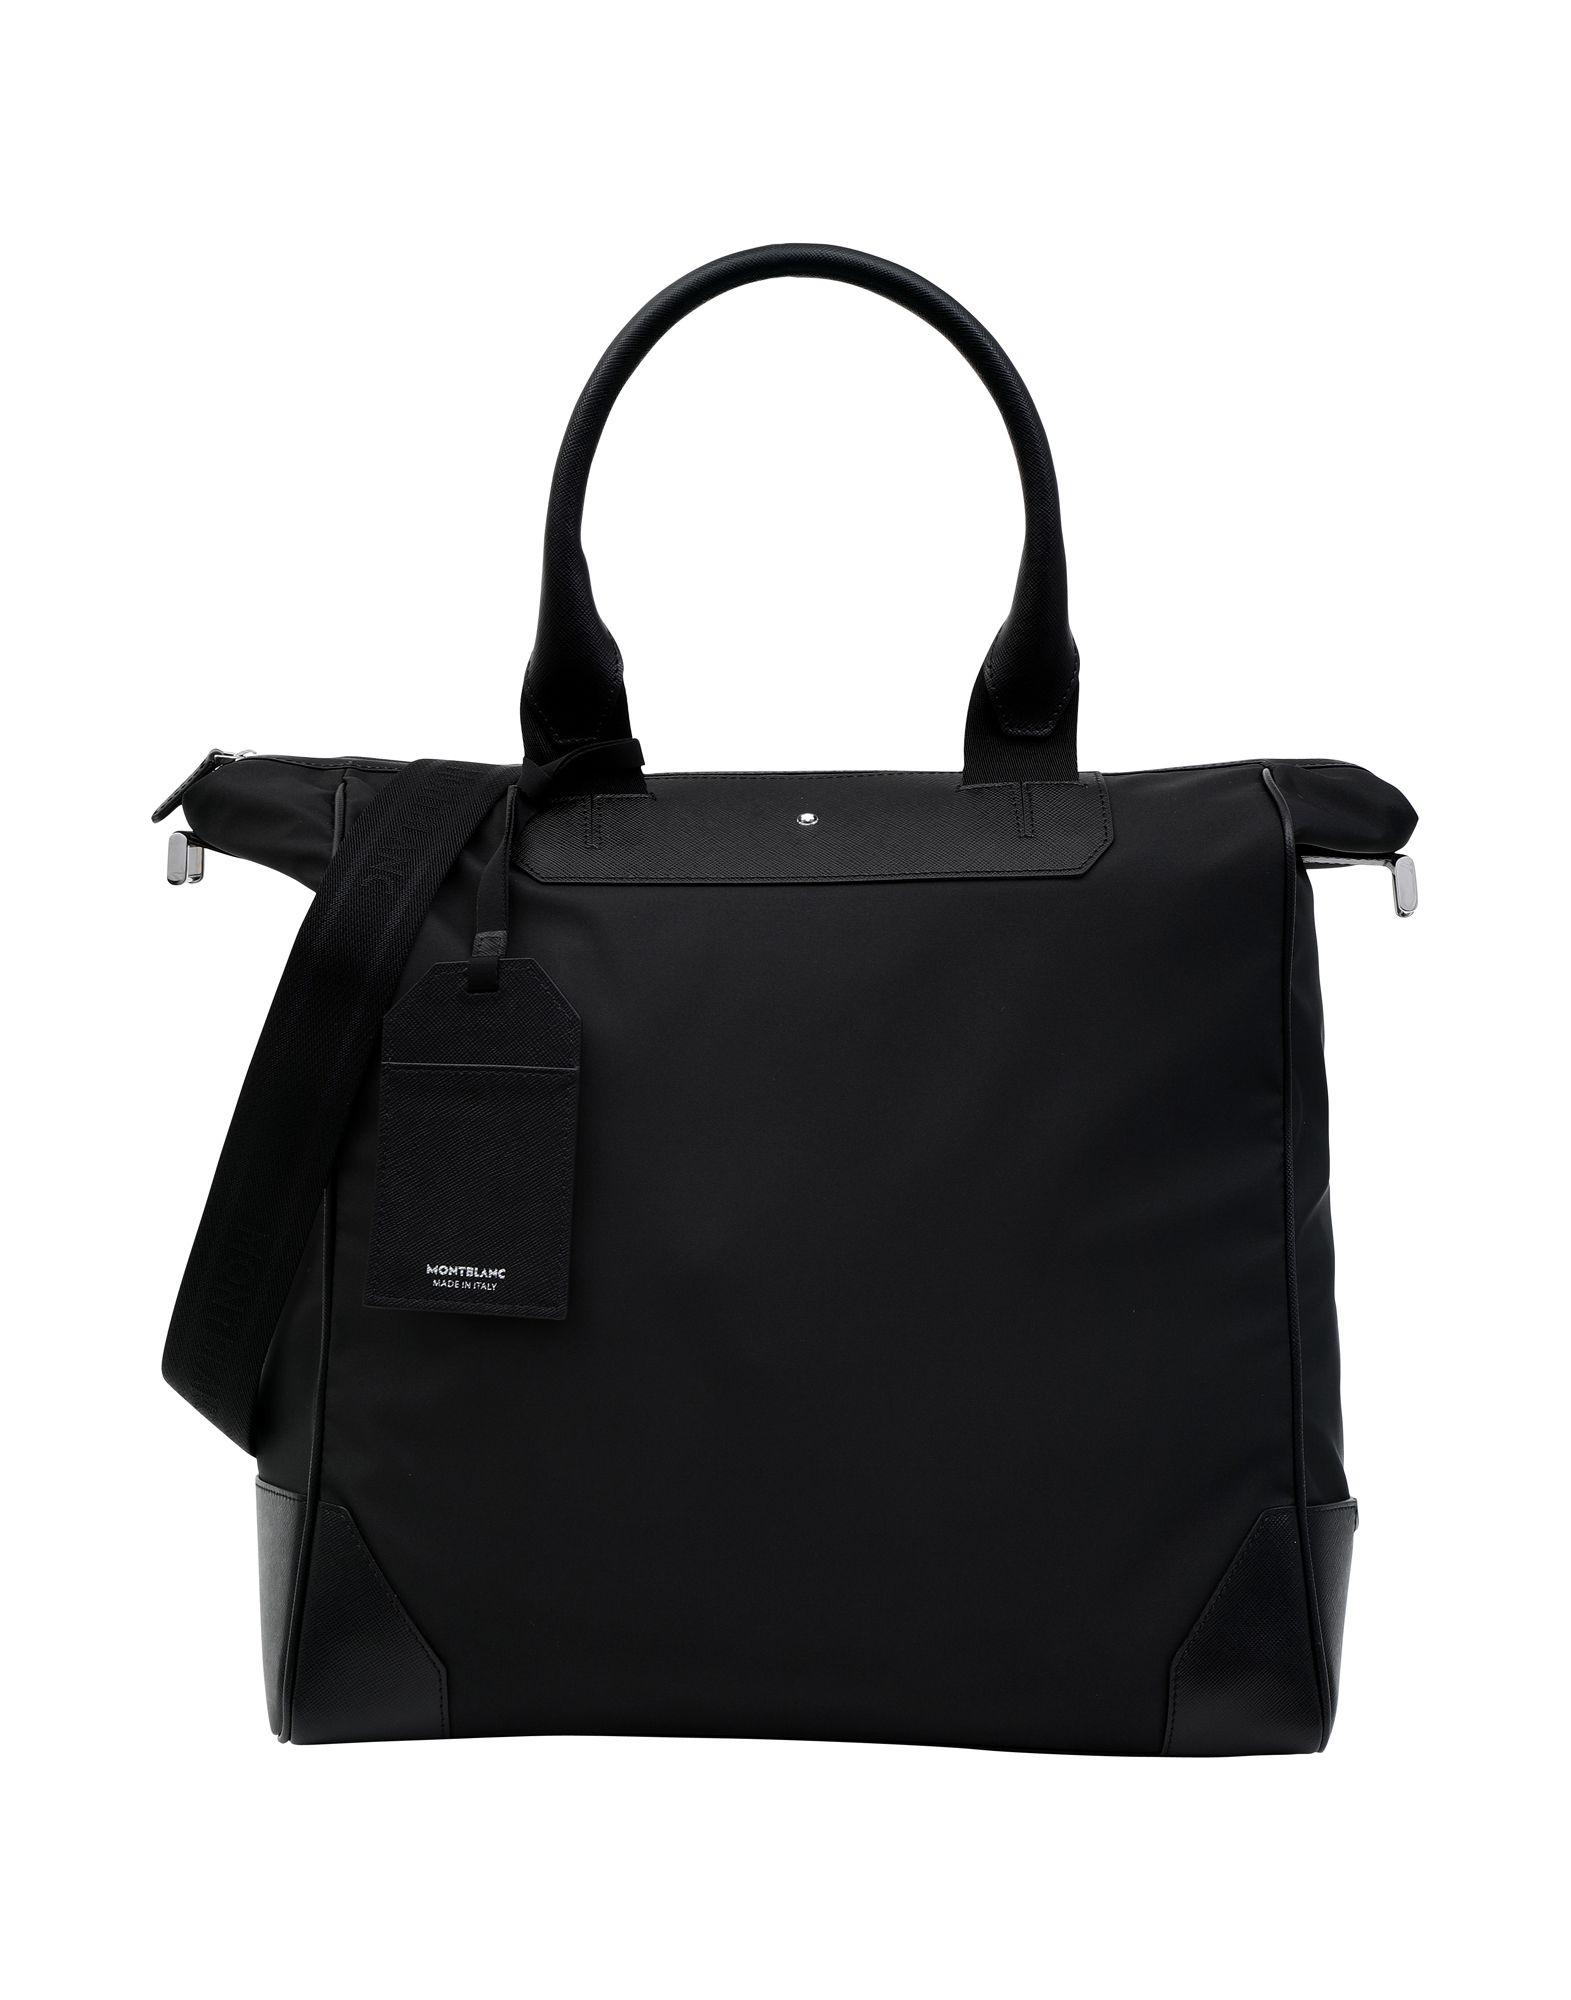 MONTBLANC Деловые сумки кожаные сумки montblanc mb113134